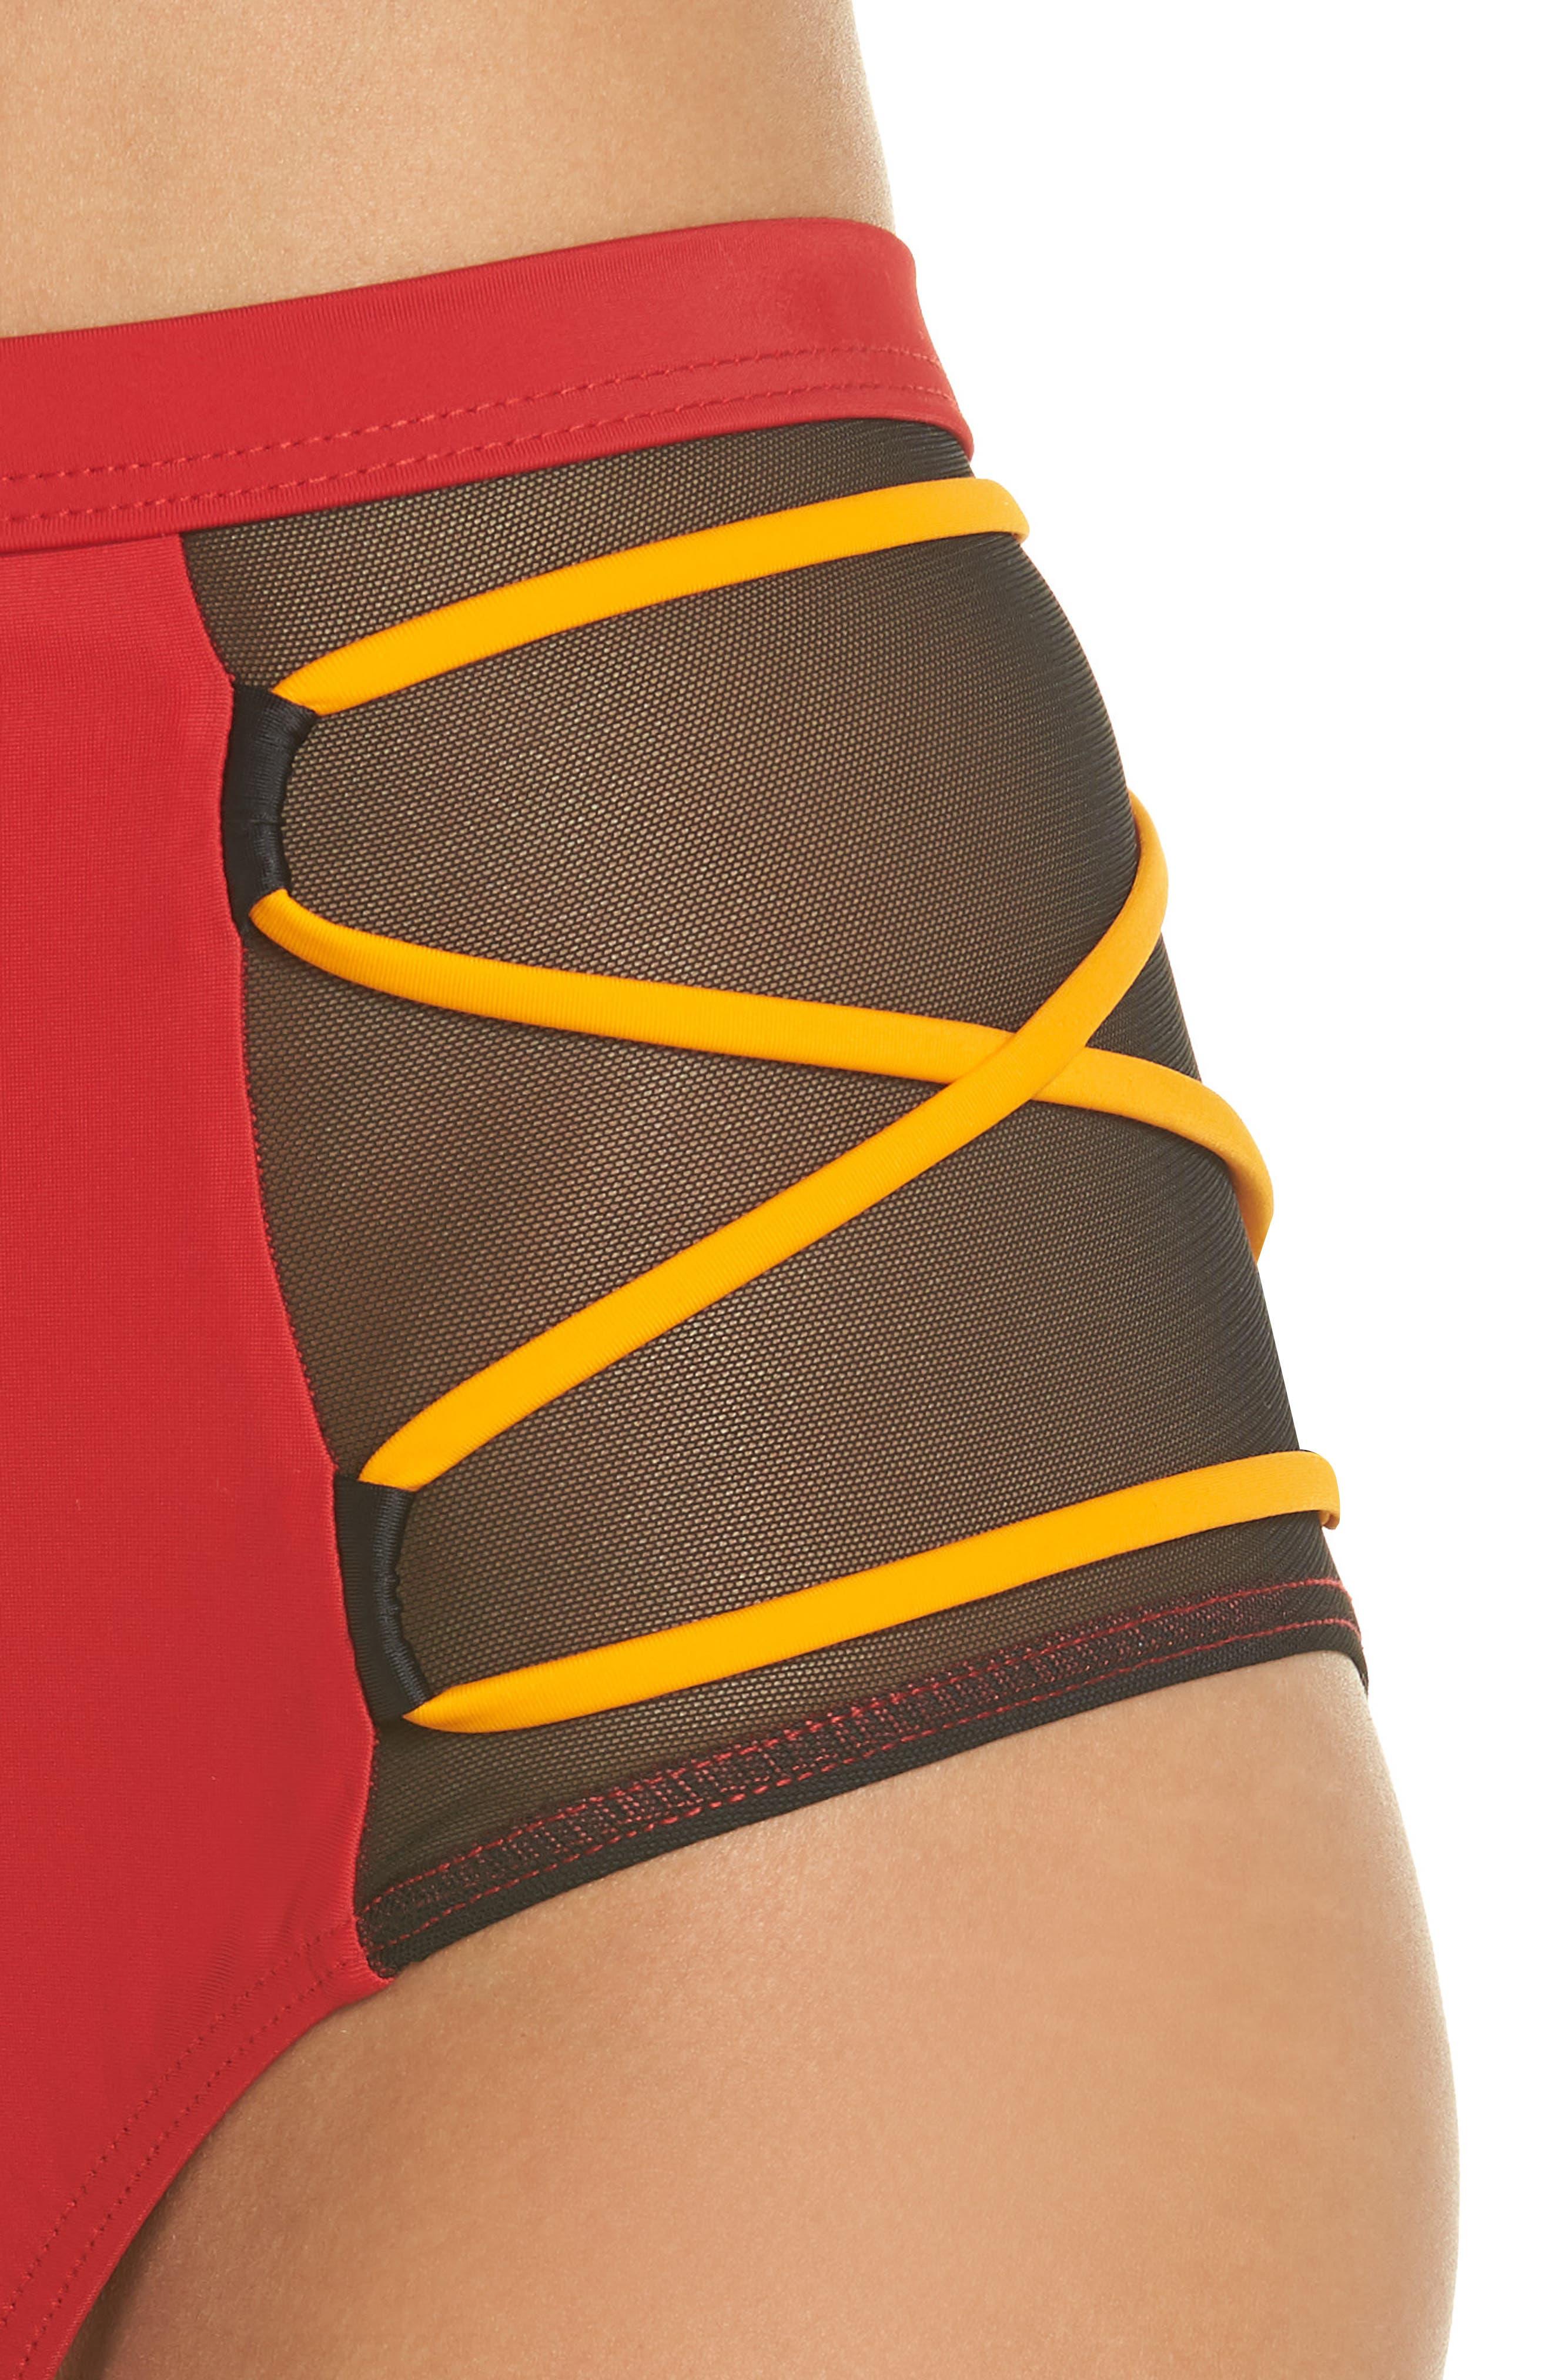 Launch Bikini Bottoms,                             Alternate thumbnail 4, color,                             Red/ Black/ Orange